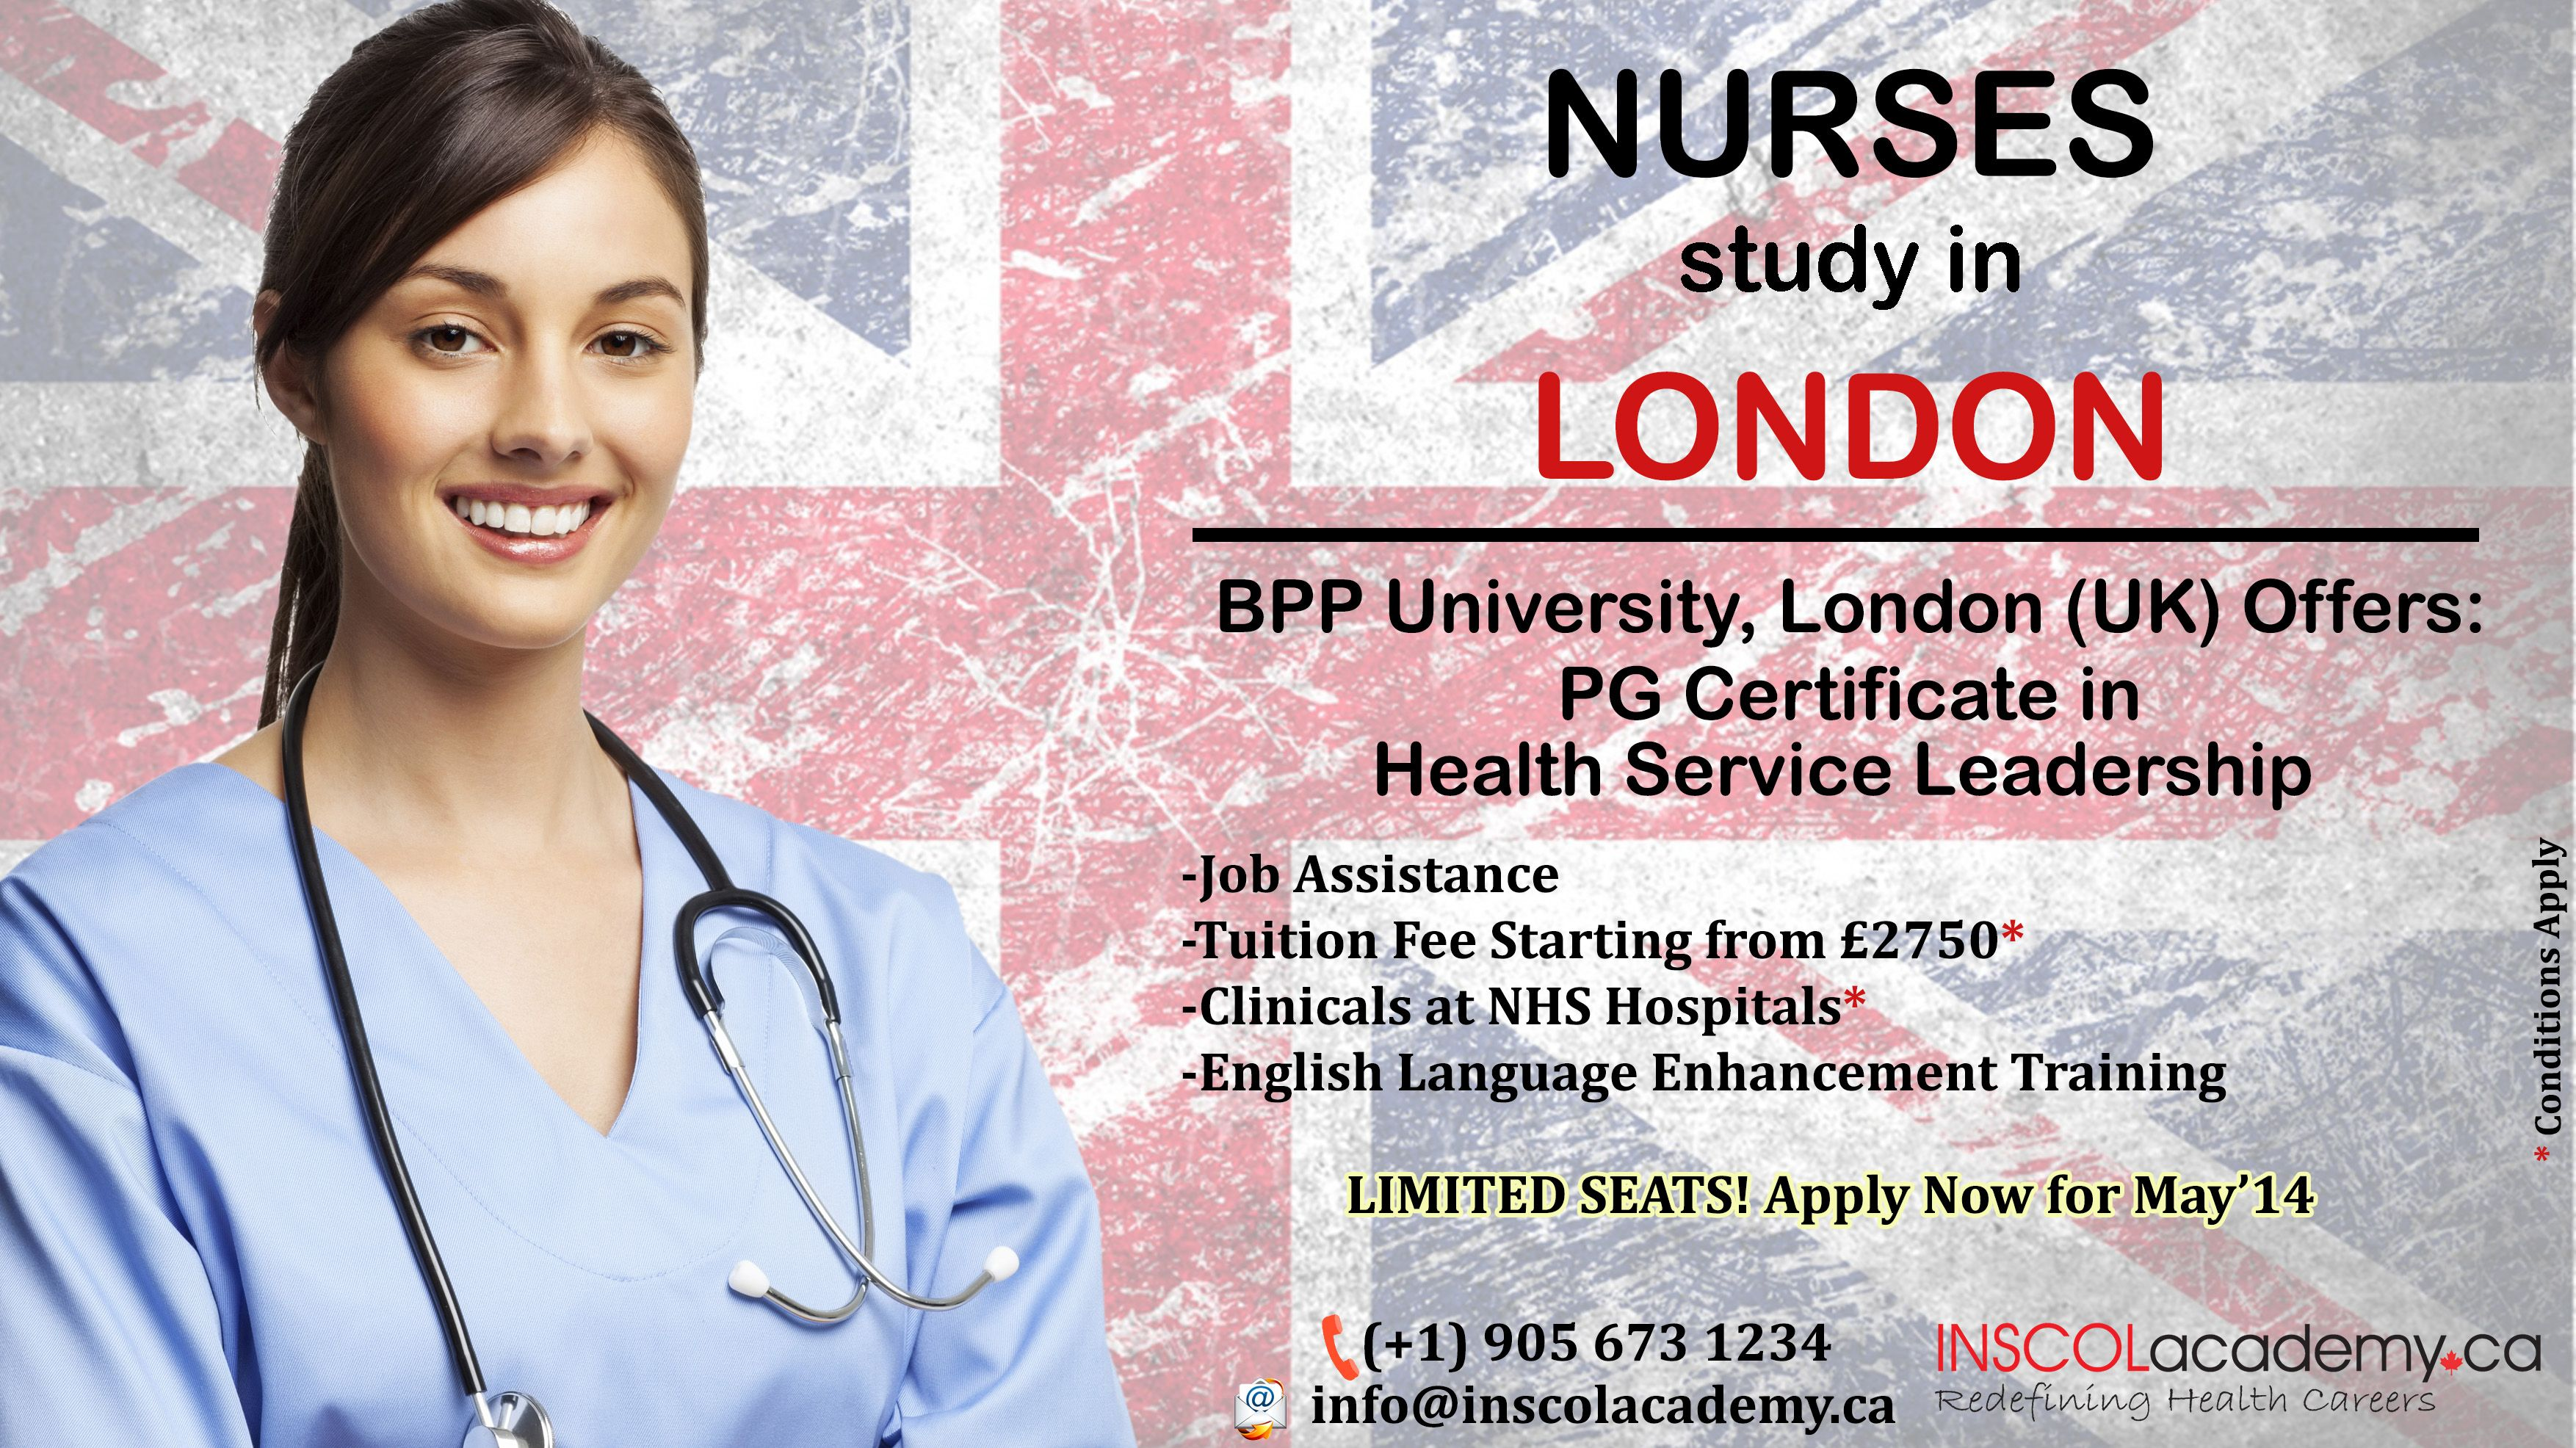 Nurses Study Pg Certificate In Health Service Leadership At Bpp